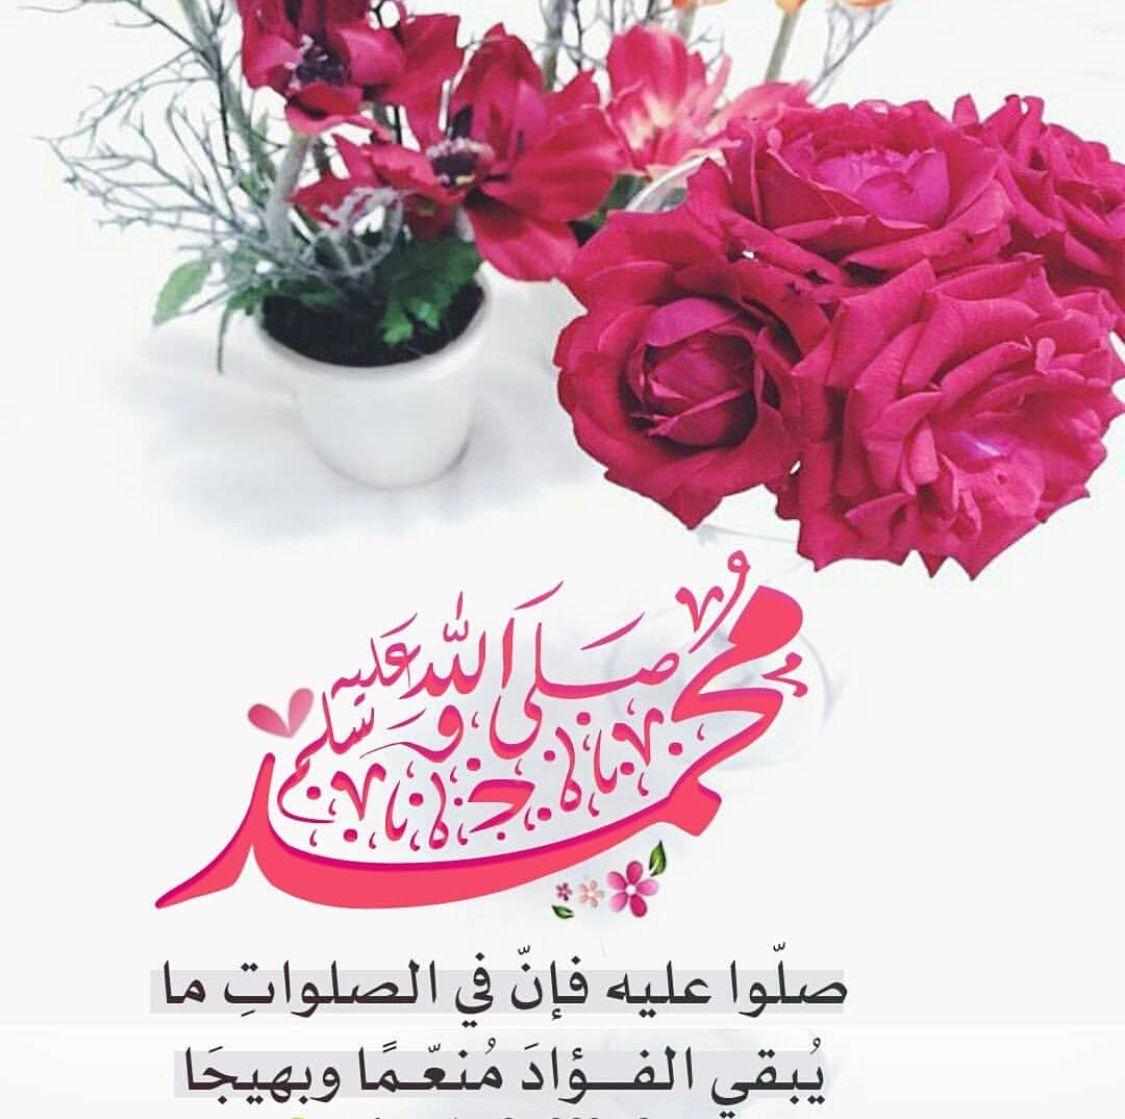 دعاء قصير ومفيد Islamic Pictures Crown Jewelry